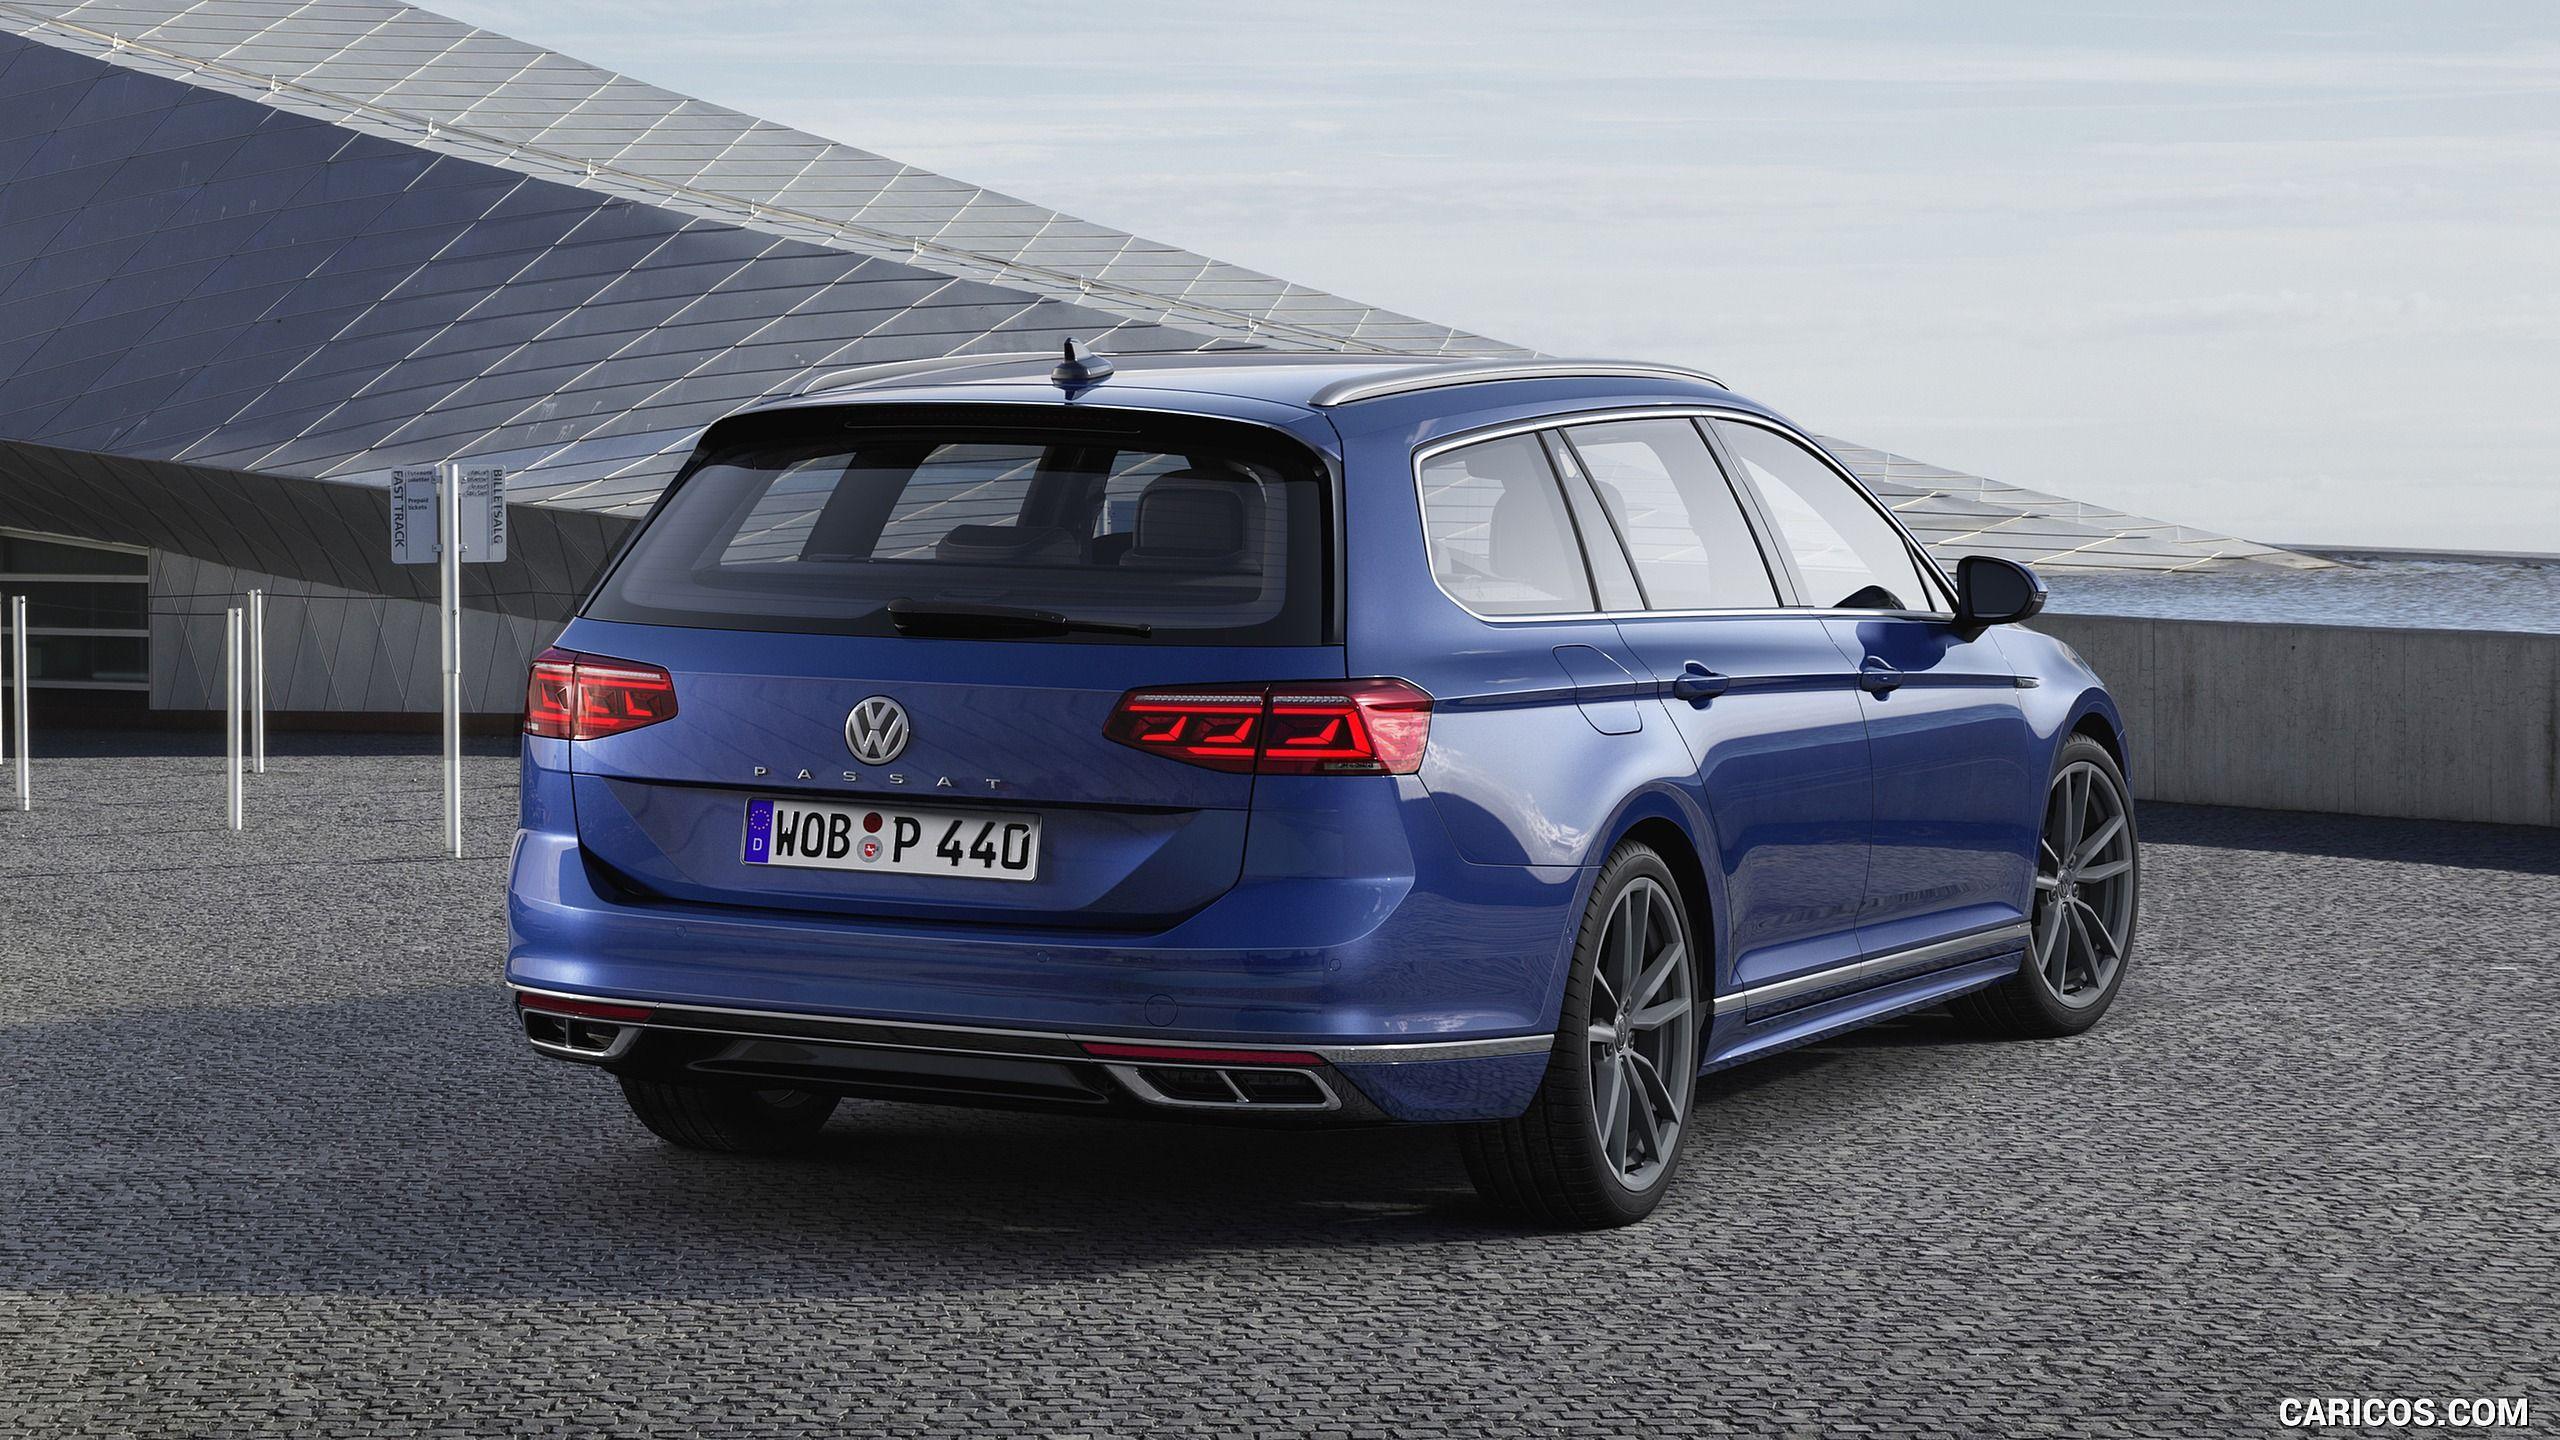 2020 Volkswagen Passat Variant Eu Spec Rear Three Quarter Hd Volkswagen Phaeton Volkswagen Volkswagen Passat